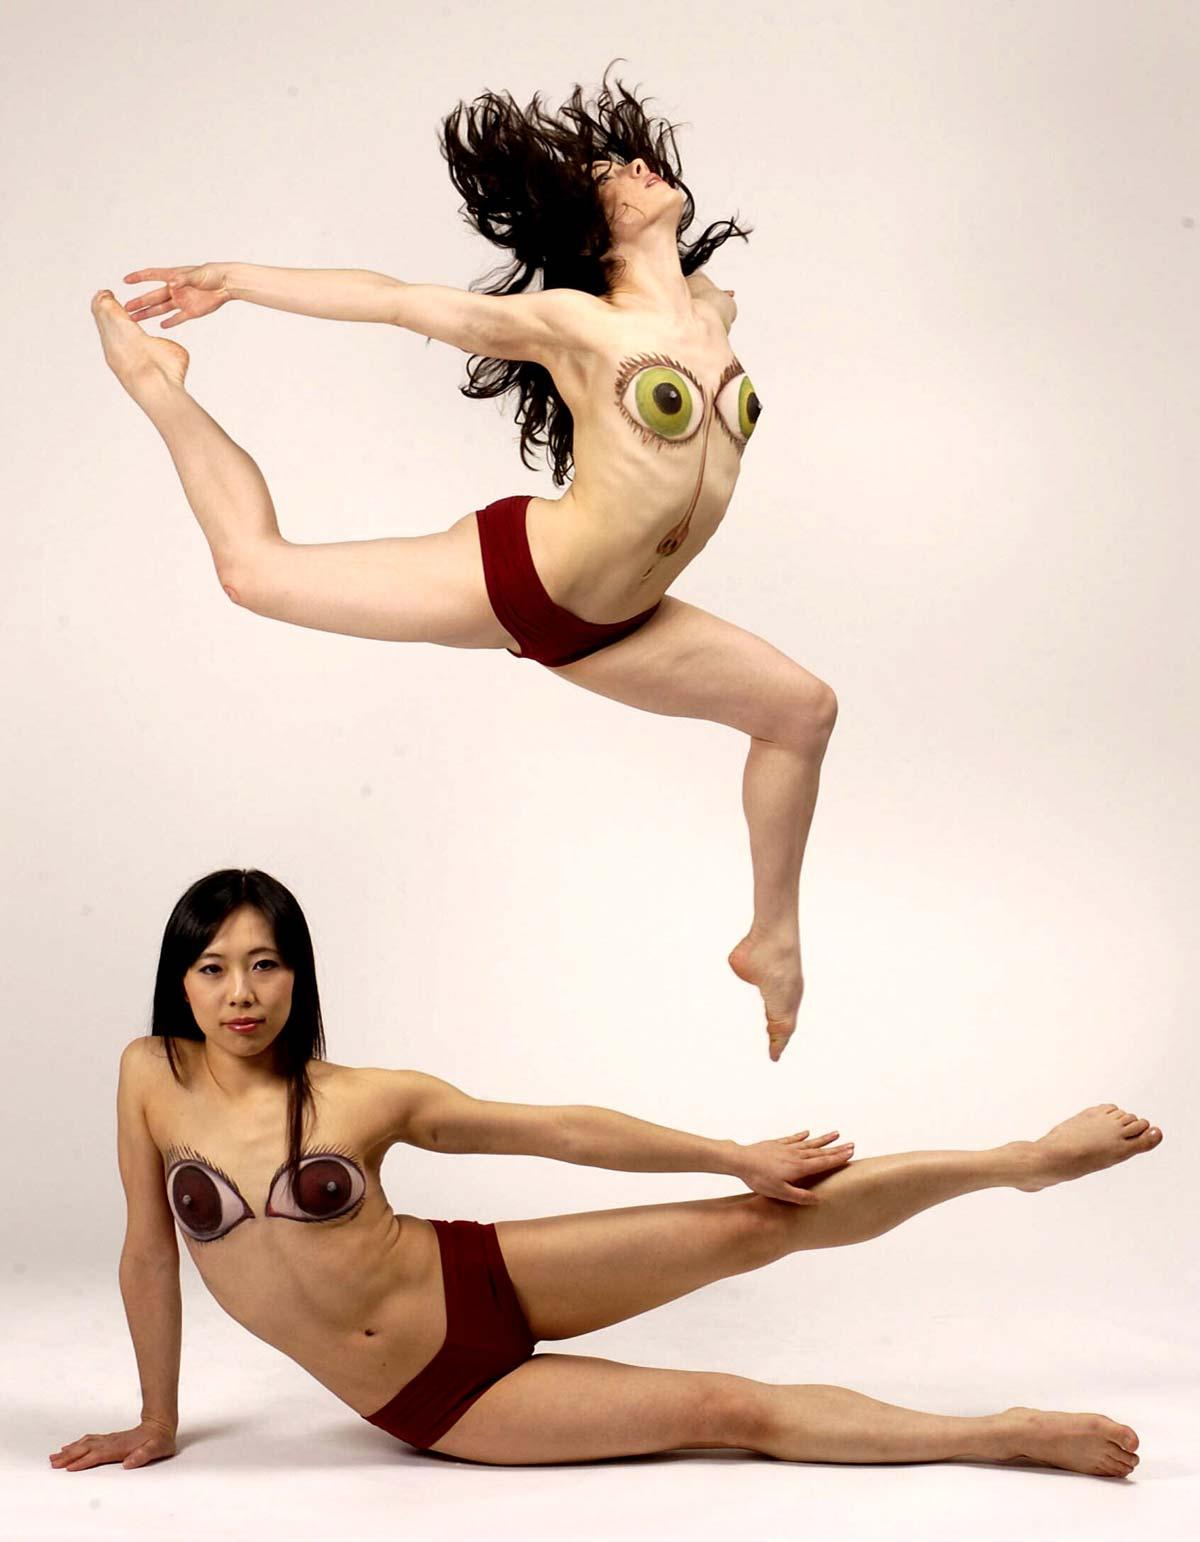 alexa-jump.jpg